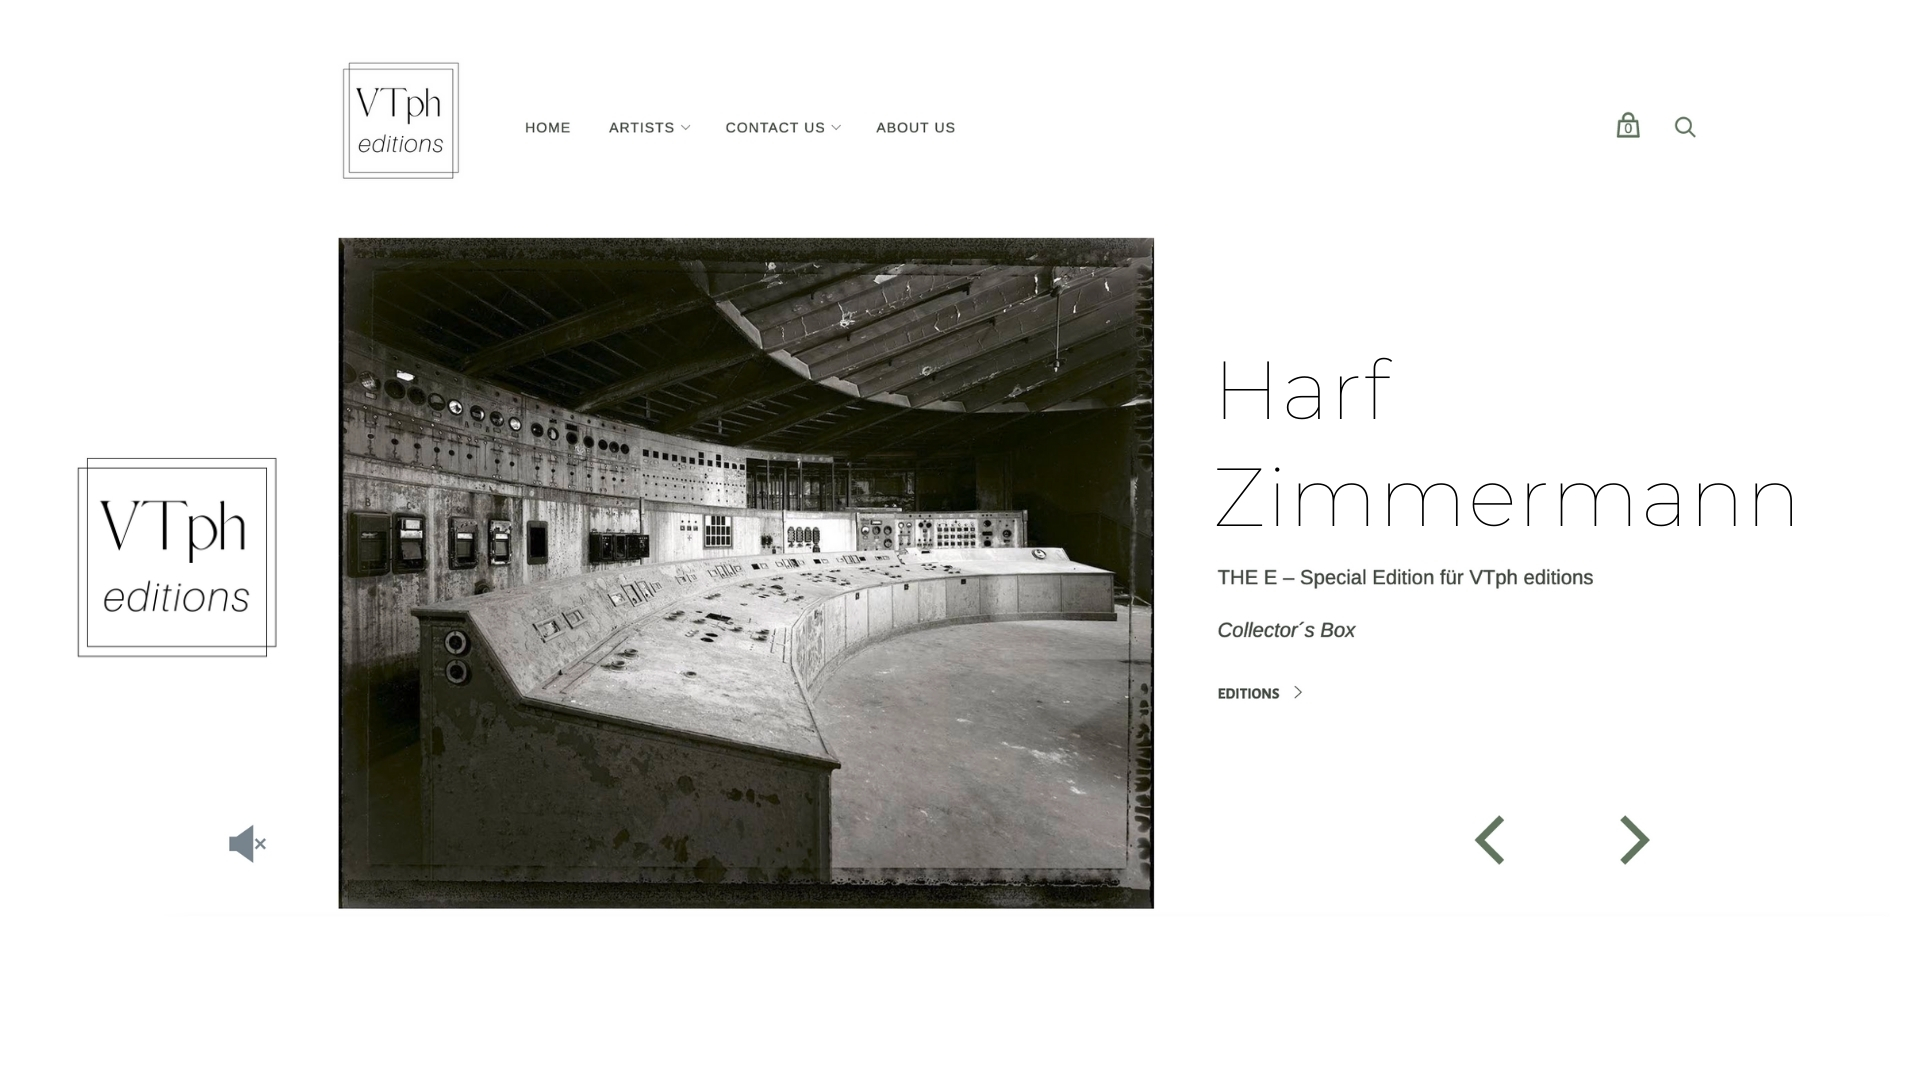 VTph editions Harf Zimmermann